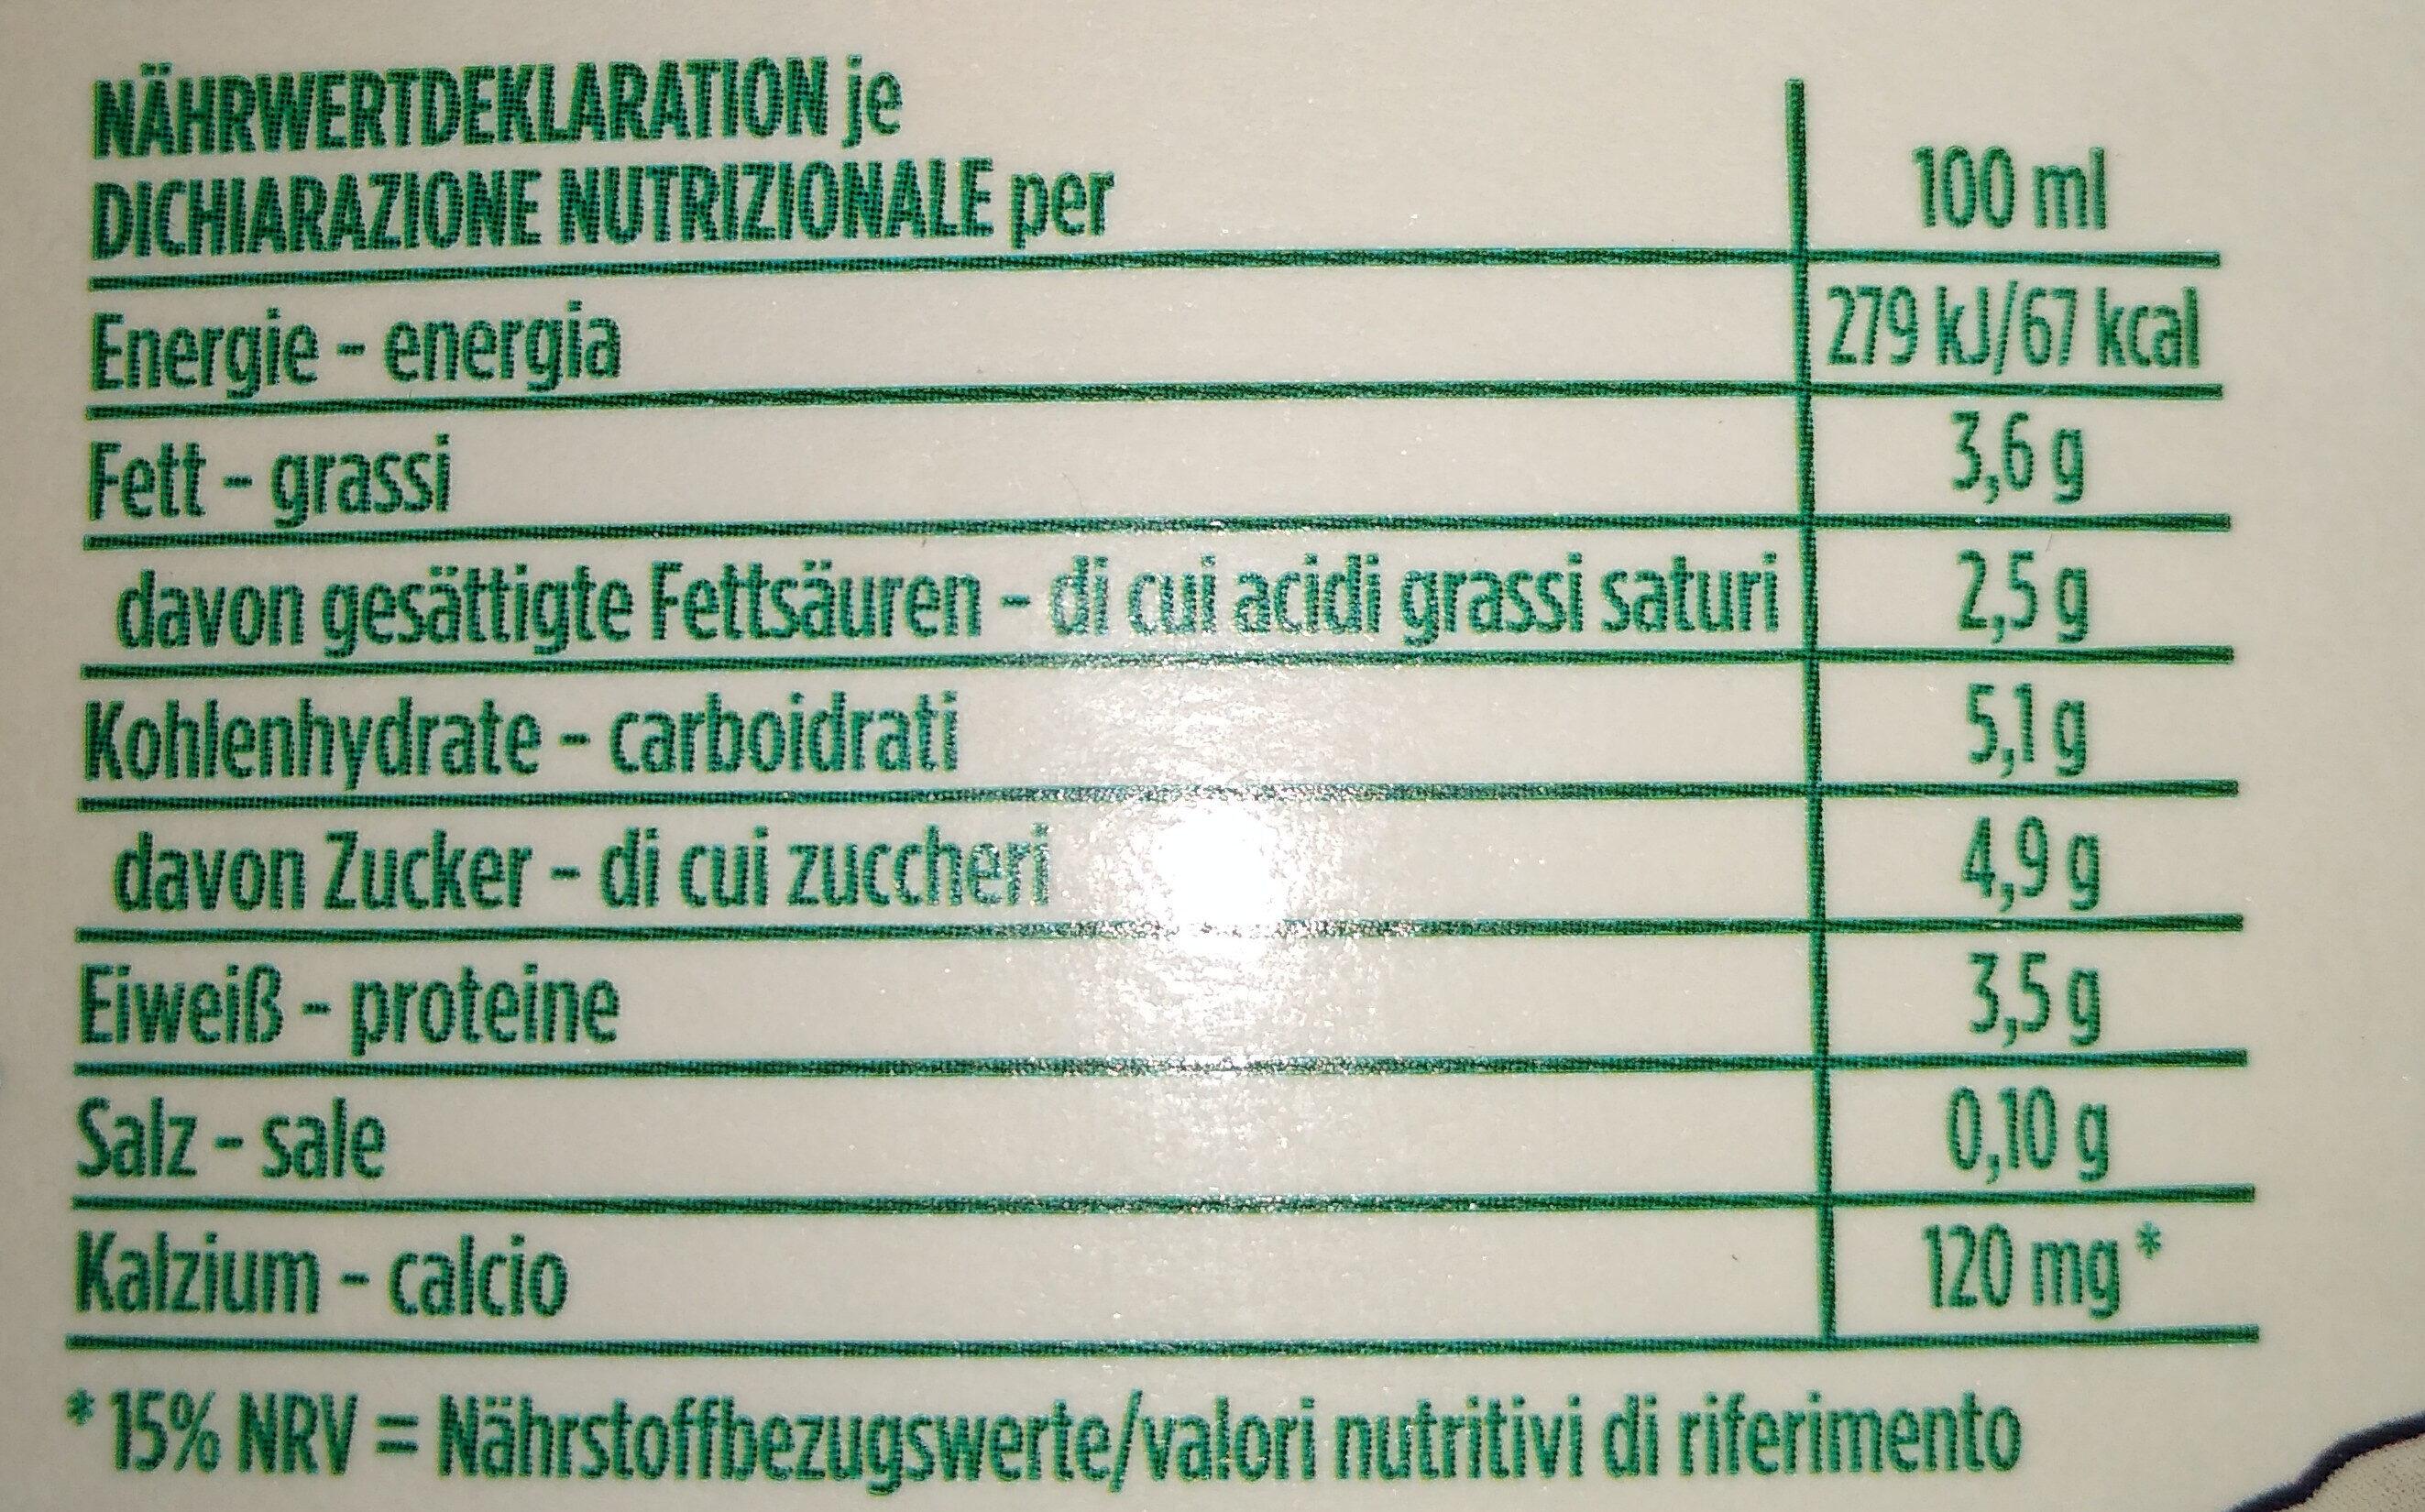 Latte fieno fresco di montagna intero - Ingredienti - it